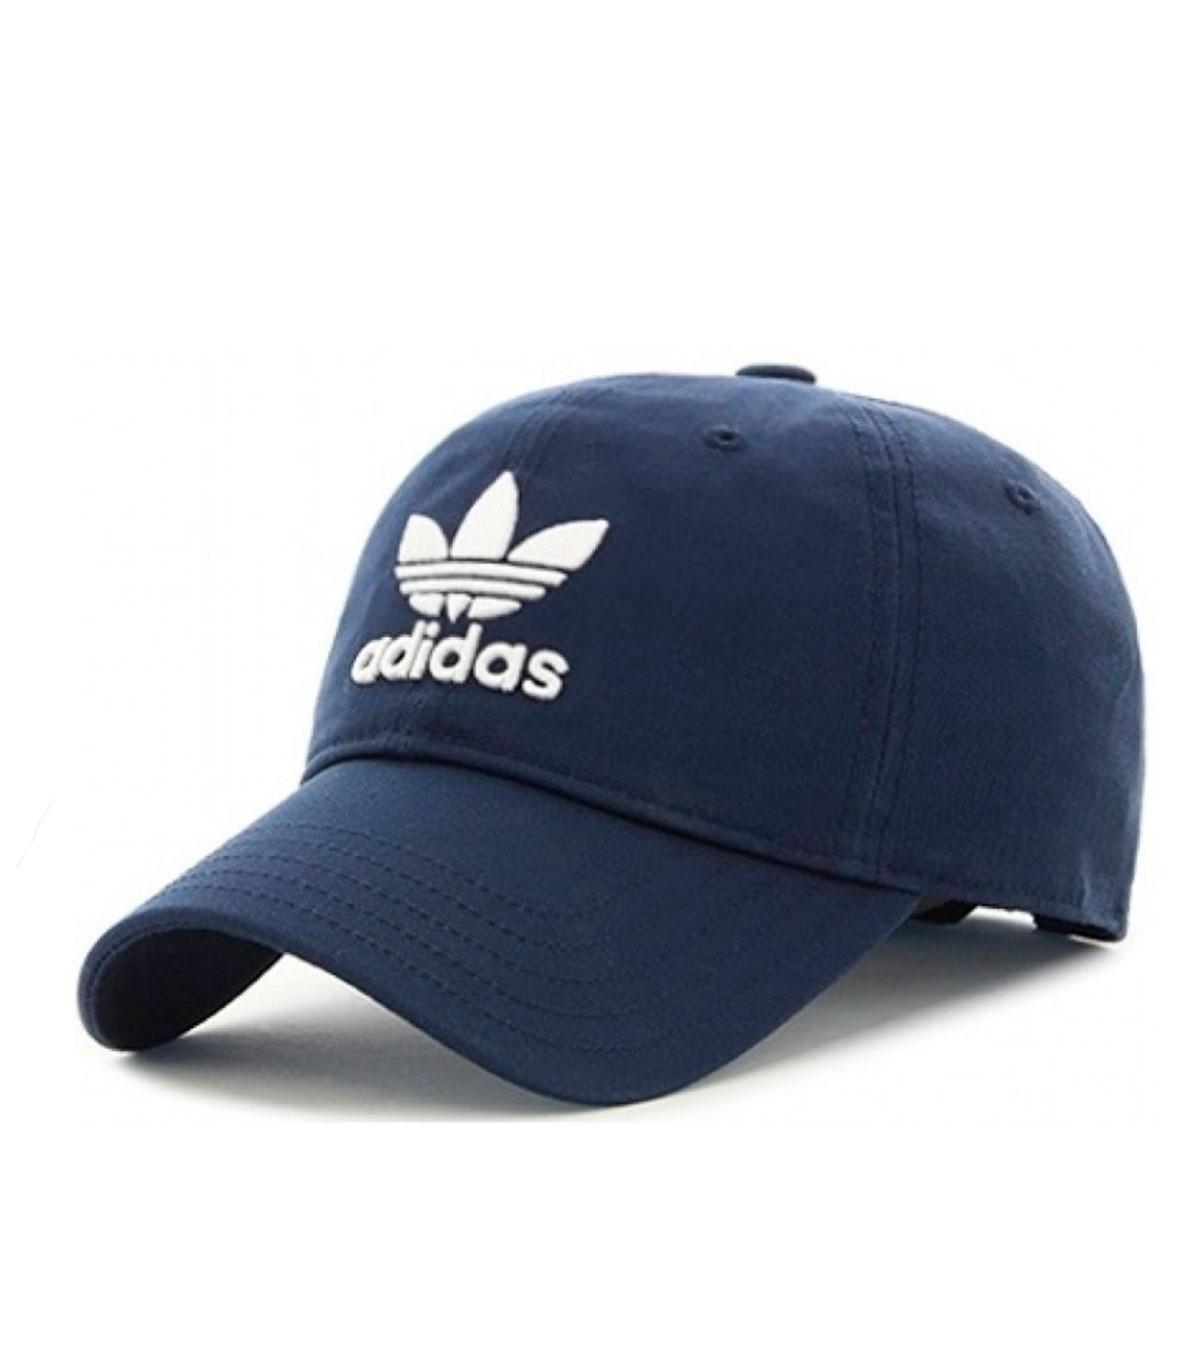 Gorra Adidas Trefoil  93ba5d93e69